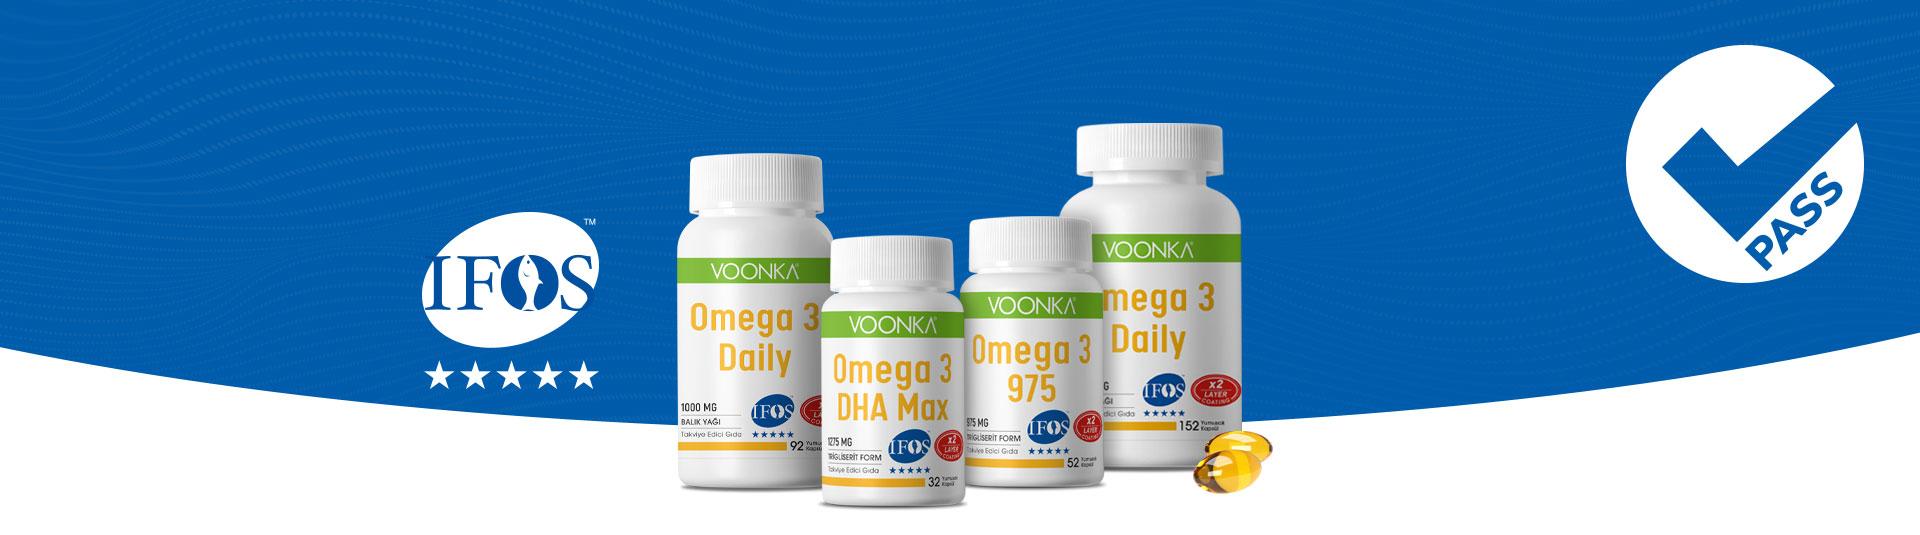 ifos-omegalar-header